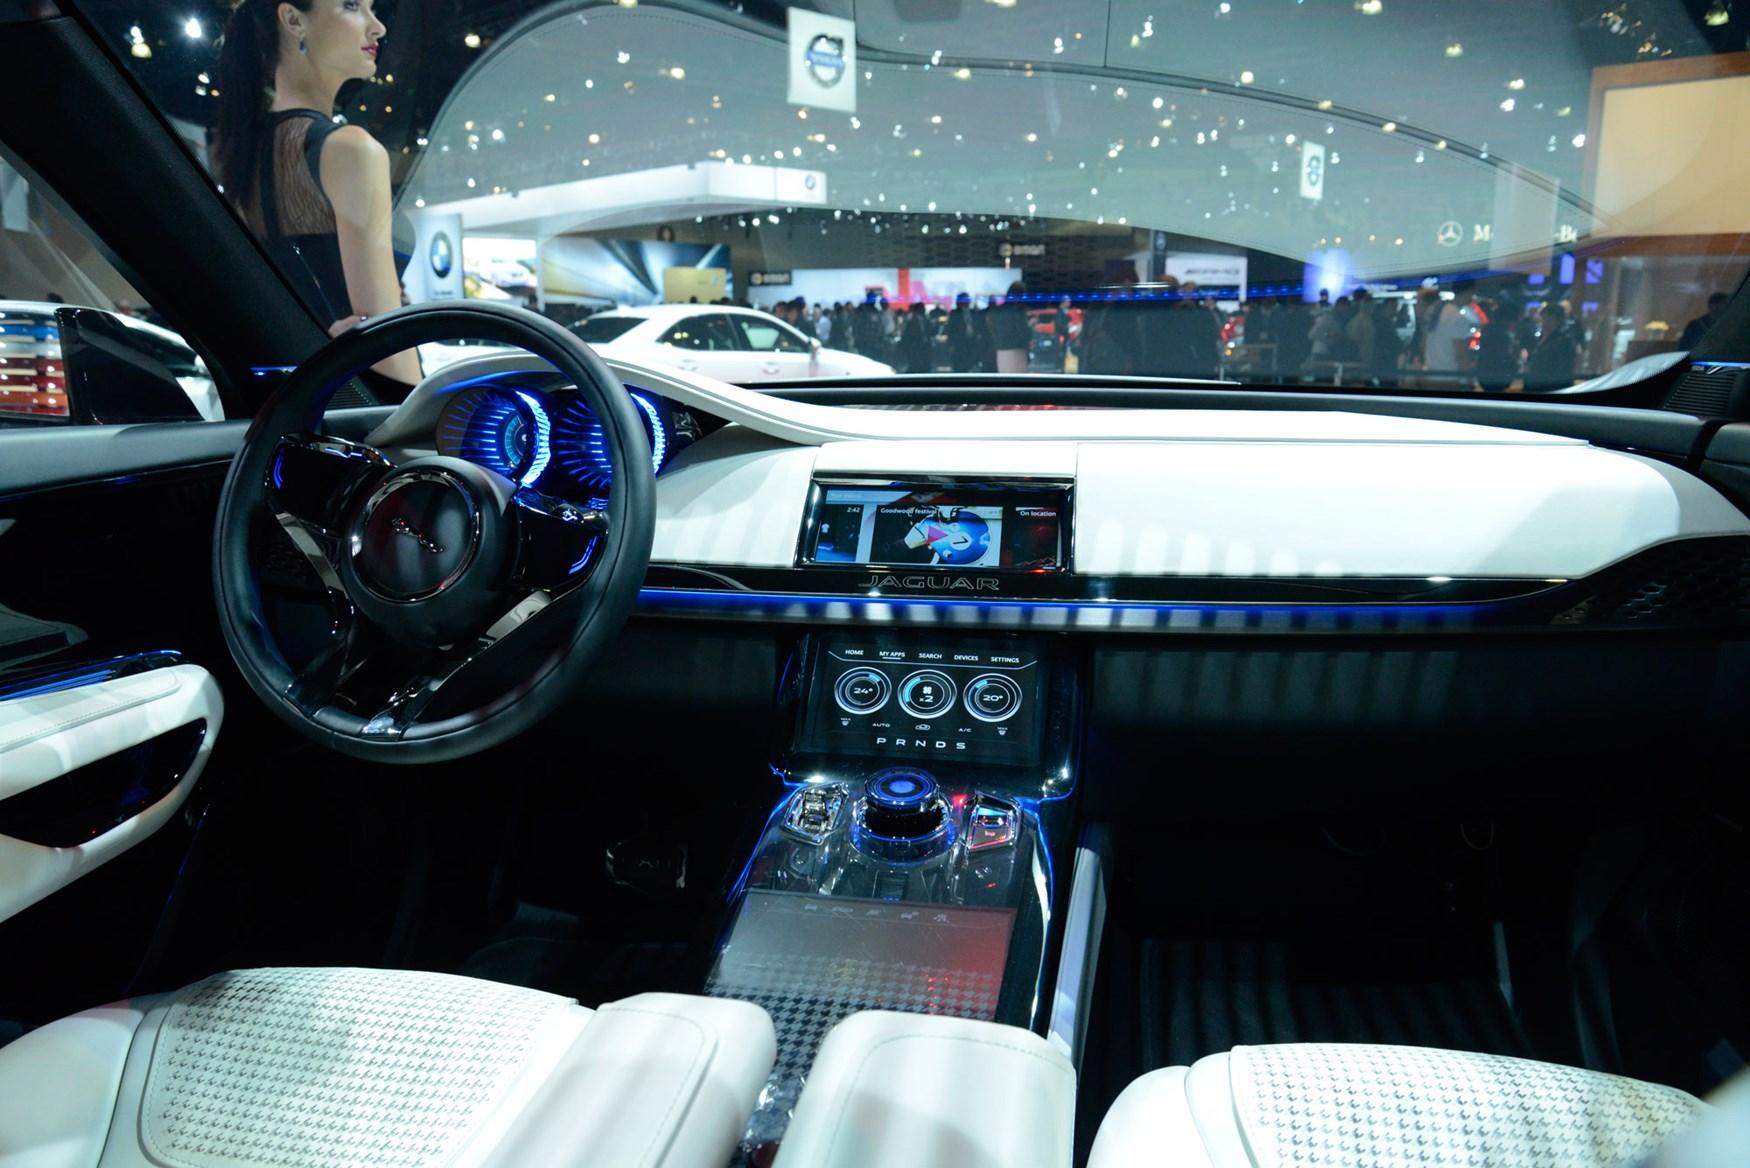 jaguar f pace interior spyshots a peek inside new jag suv by car magazine. Black Bedroom Furniture Sets. Home Design Ideas